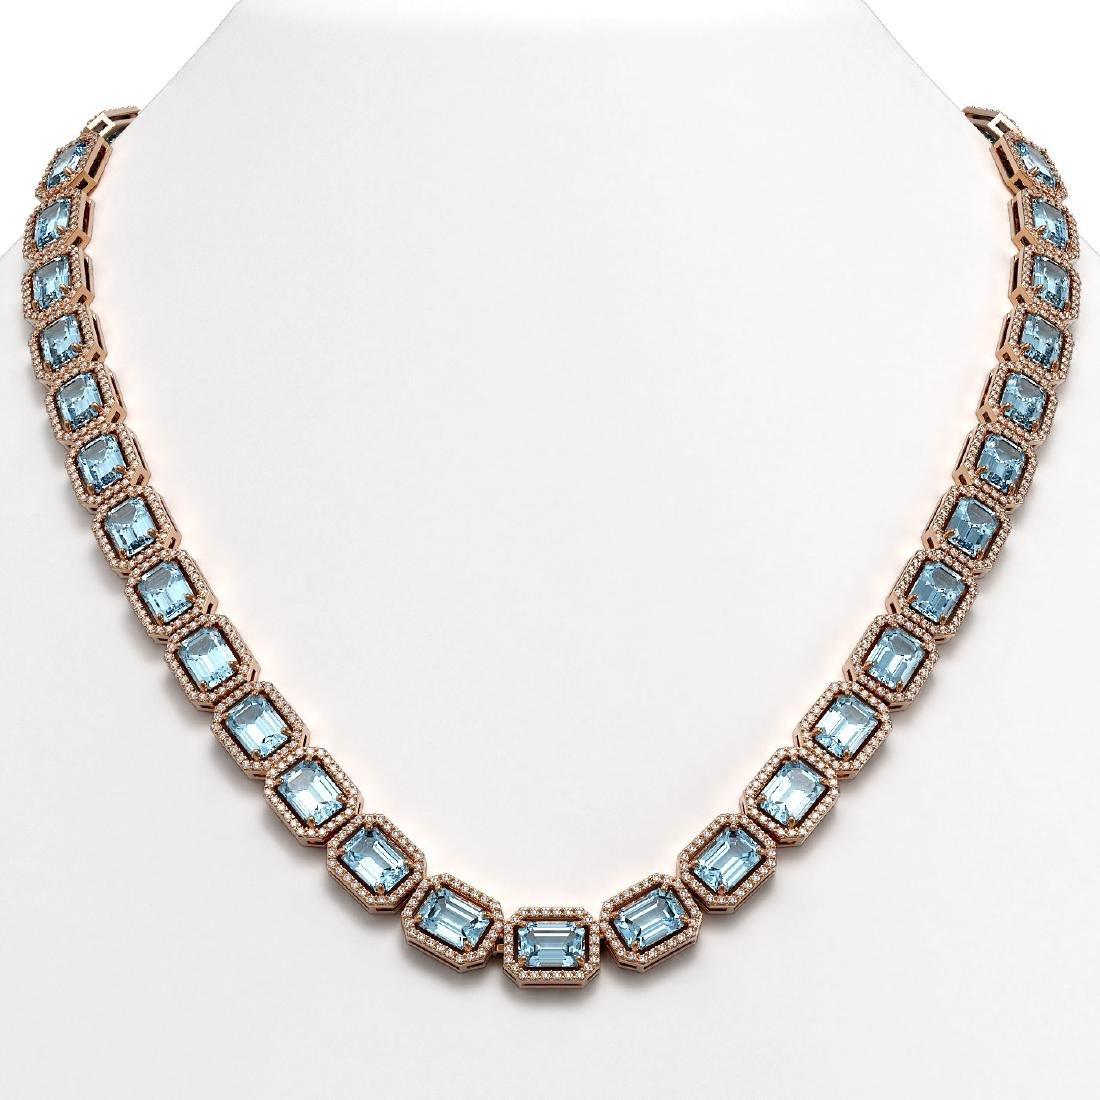 54.79 CTW Aquamarine & Diamond Halo Necklace 10K Rose